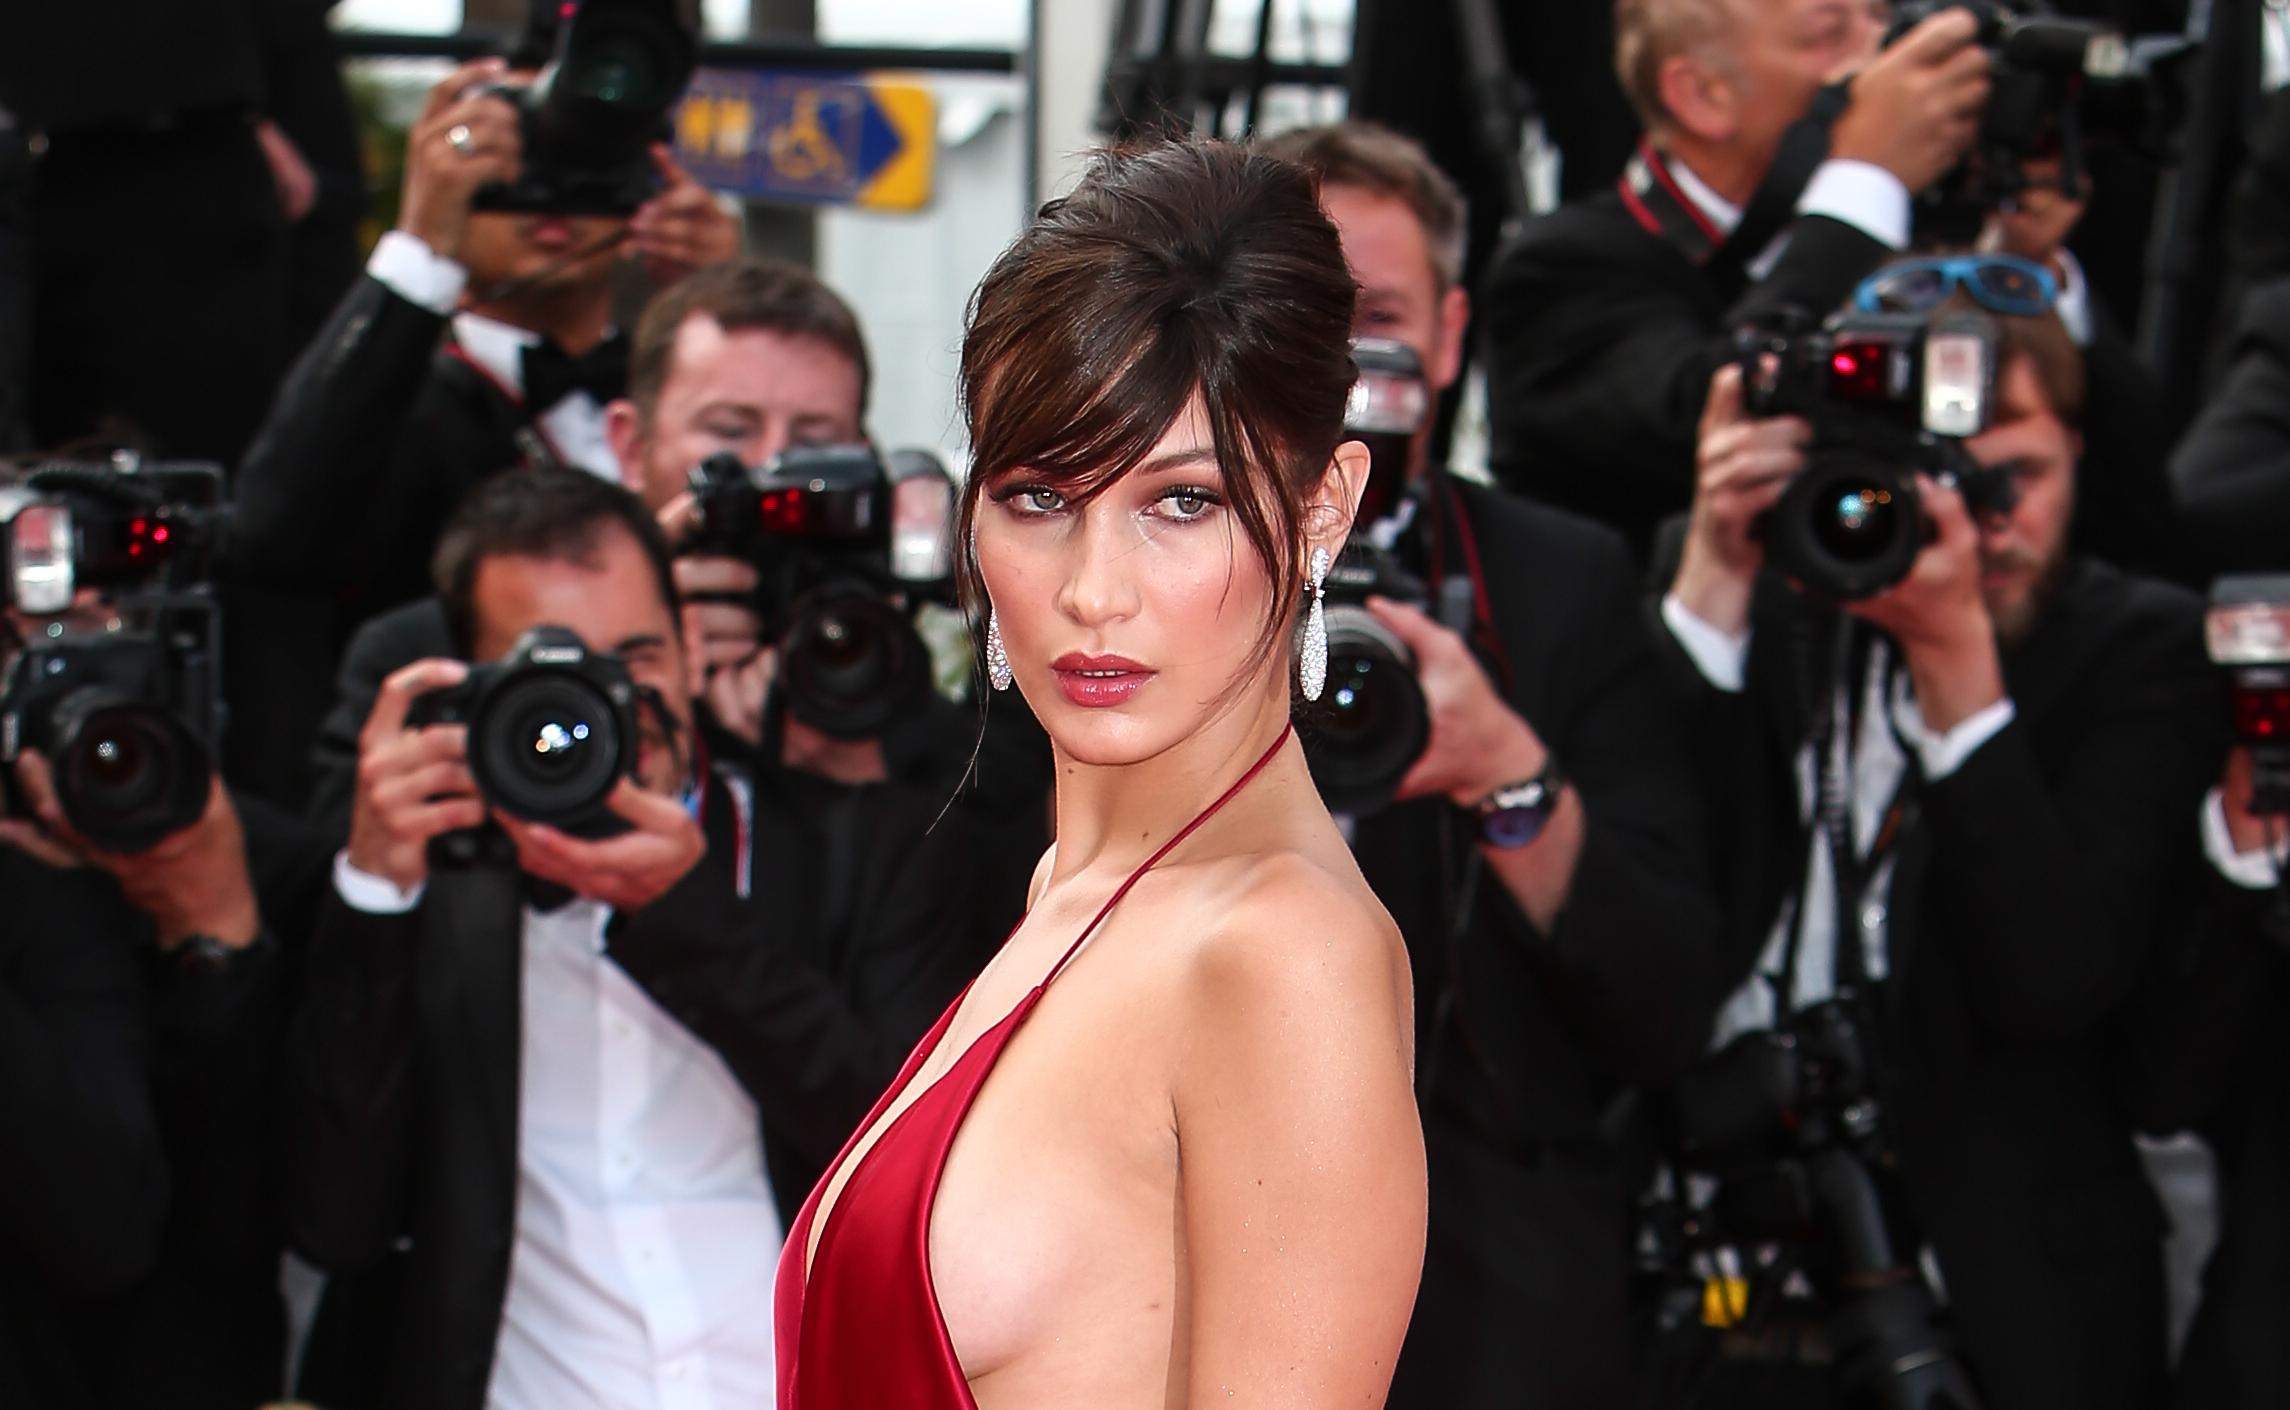 19 Insane Celebrity Doppelgängers